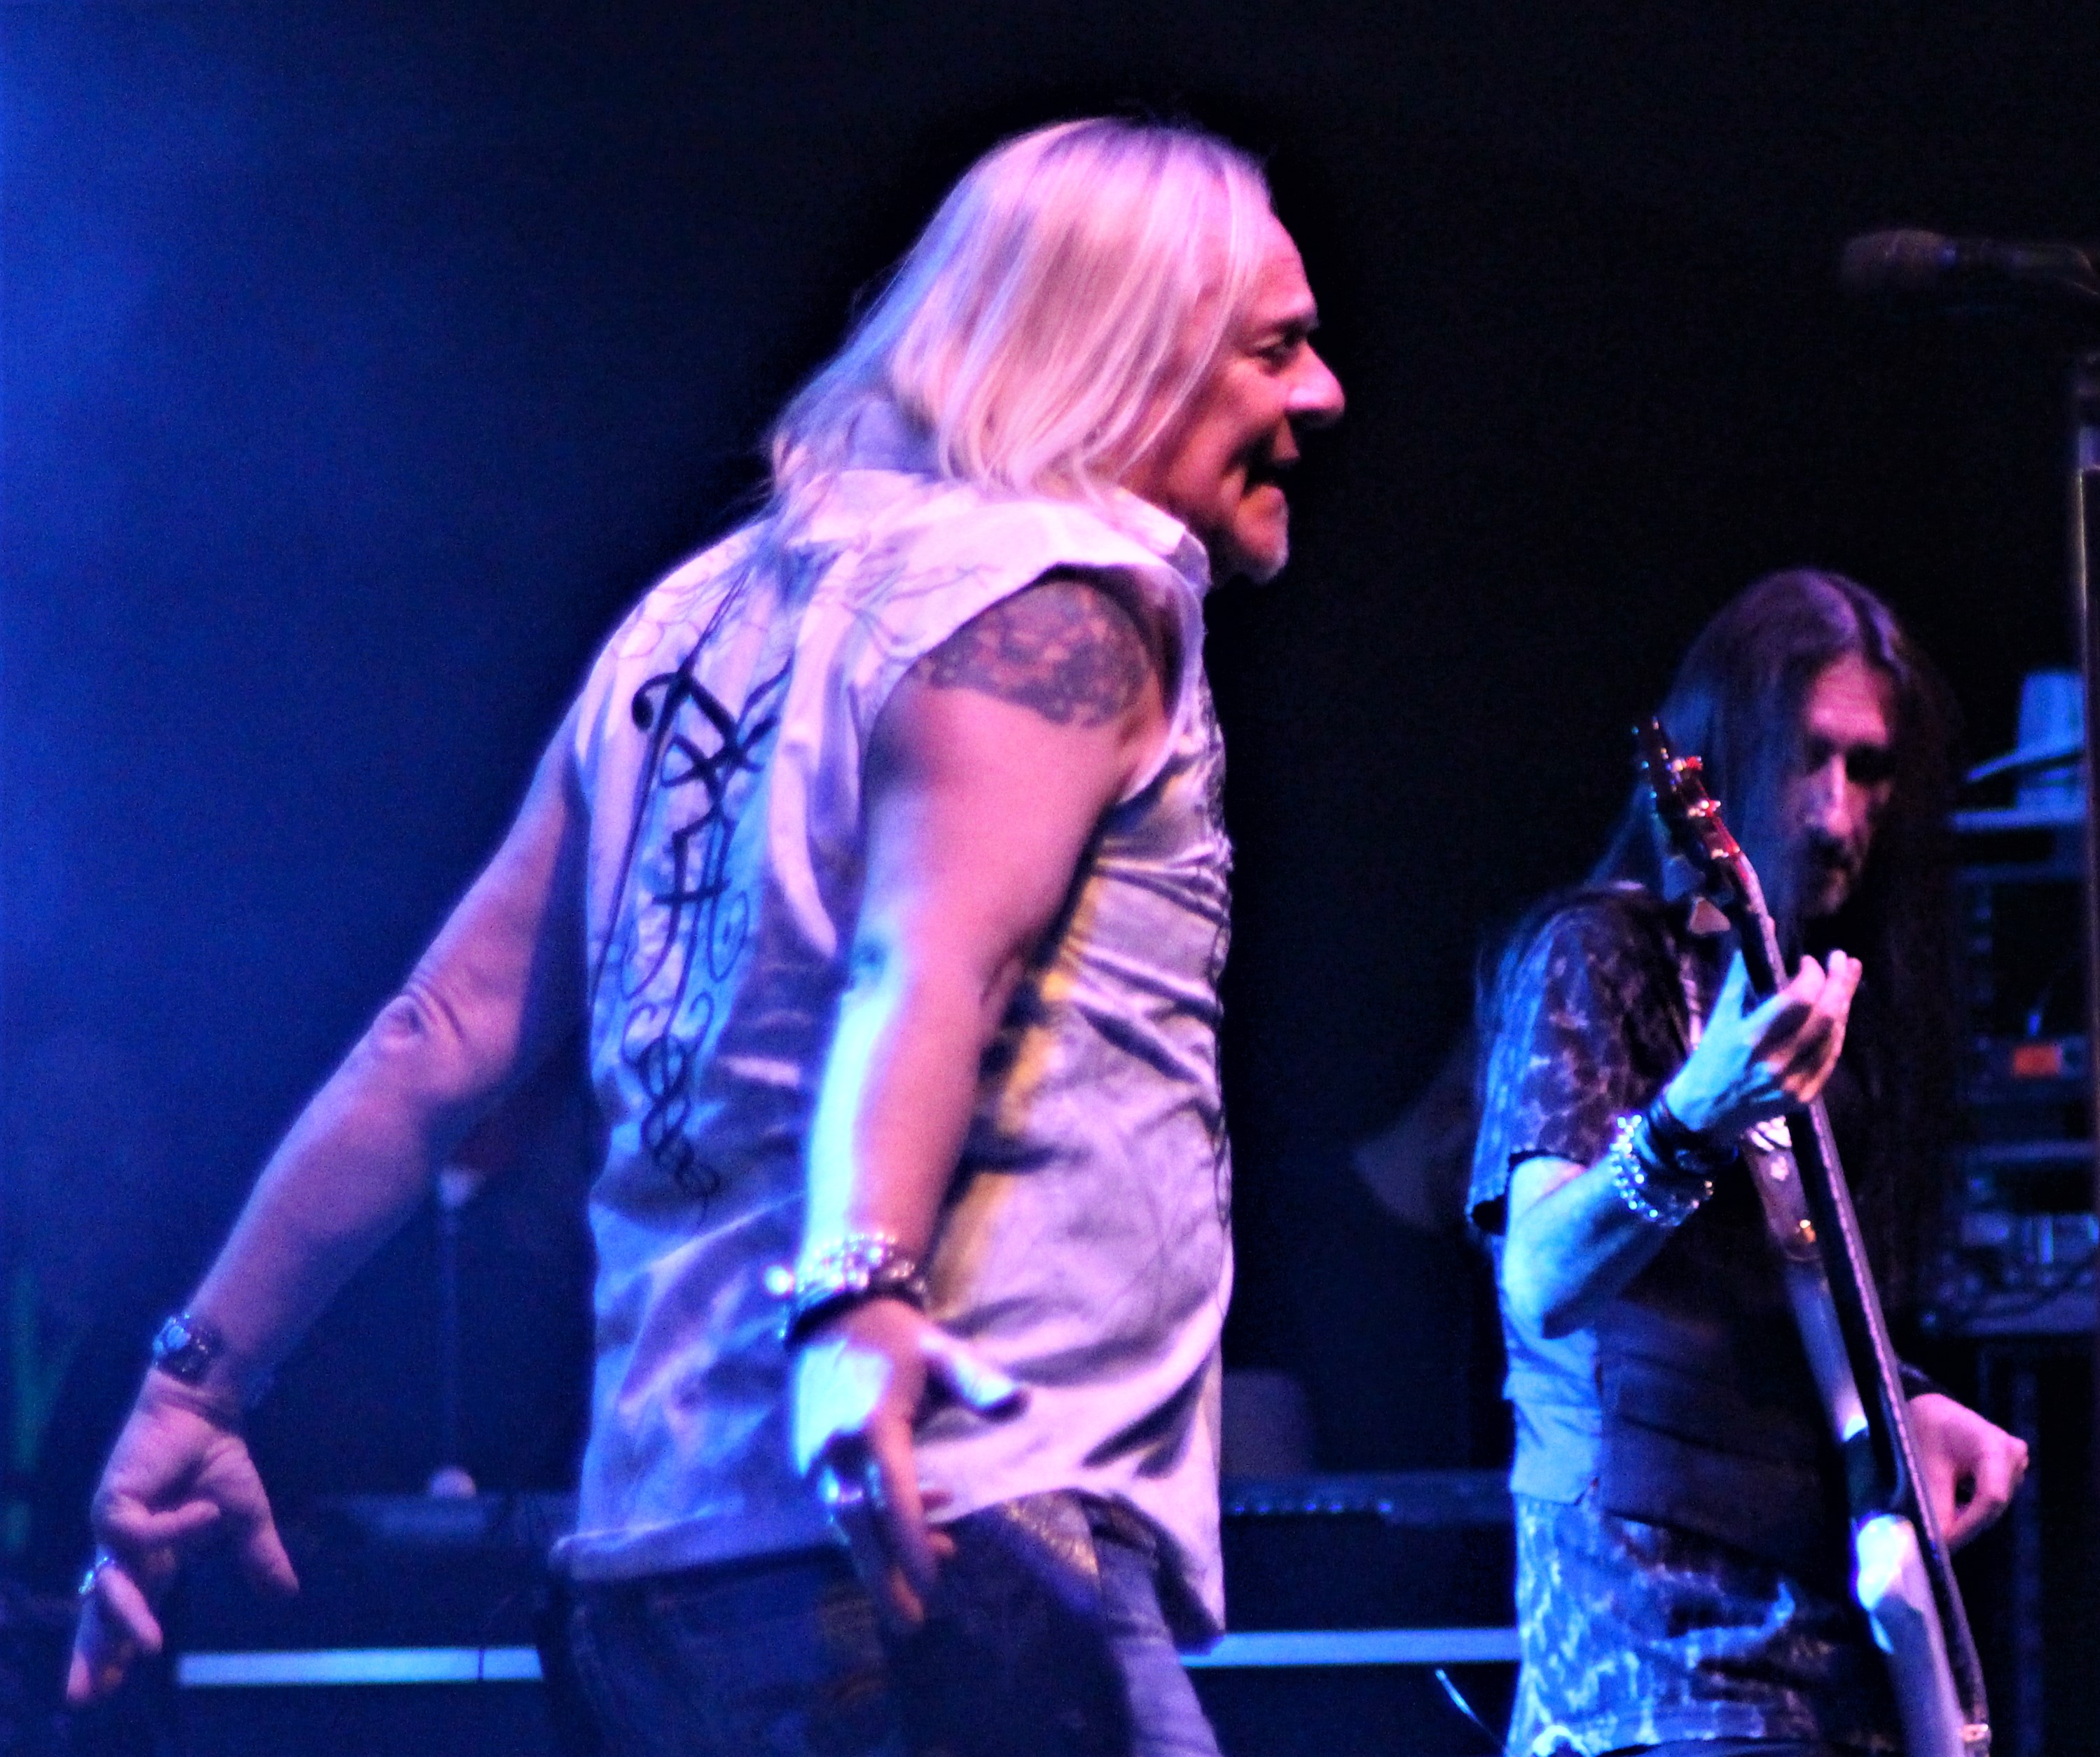 Day 2 - Main Stage_6 - Uriah Heep (2)